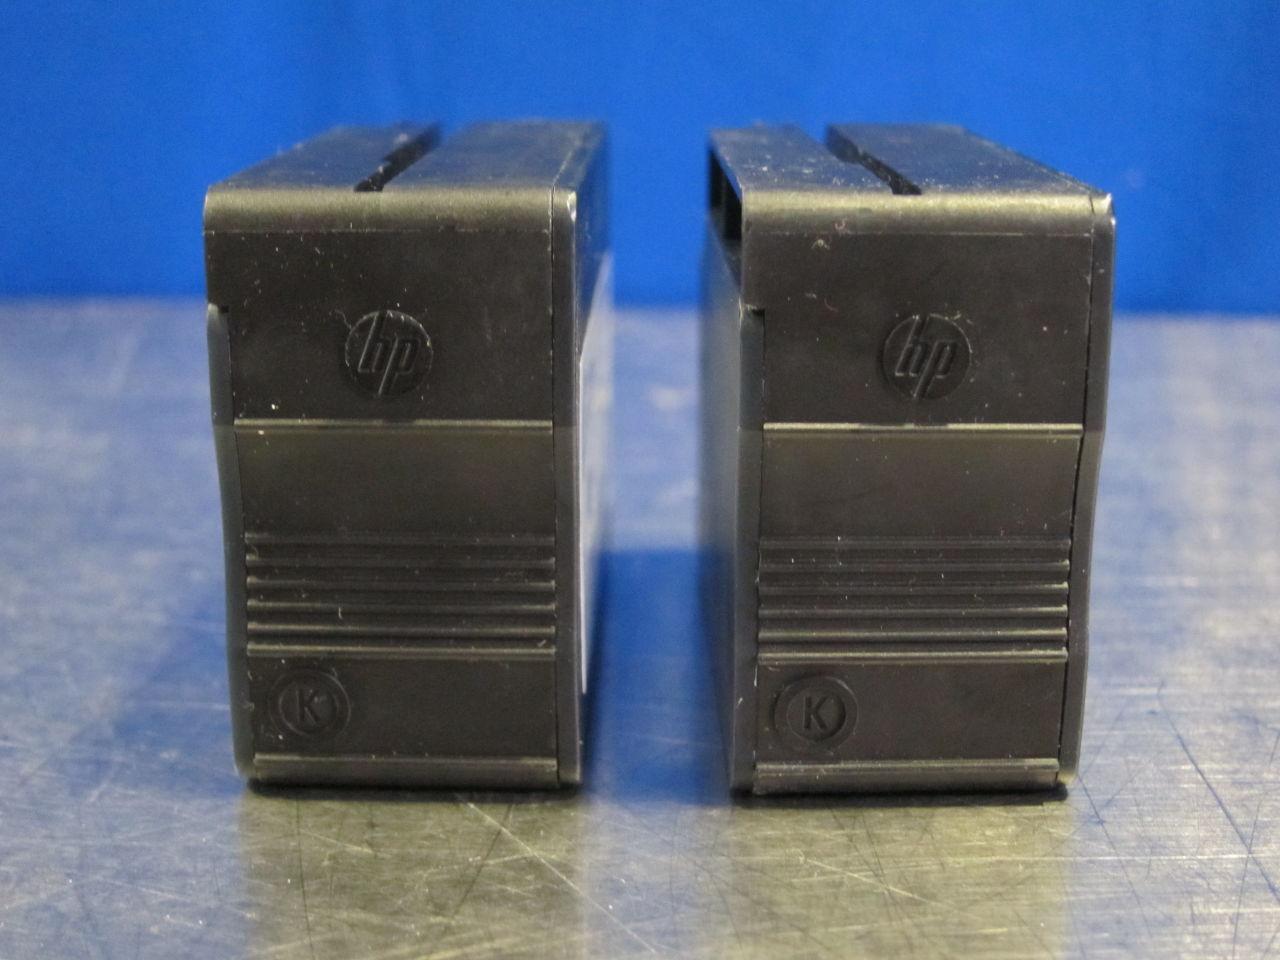 HP 932xL Black Ink Cartridges - Lot of 2